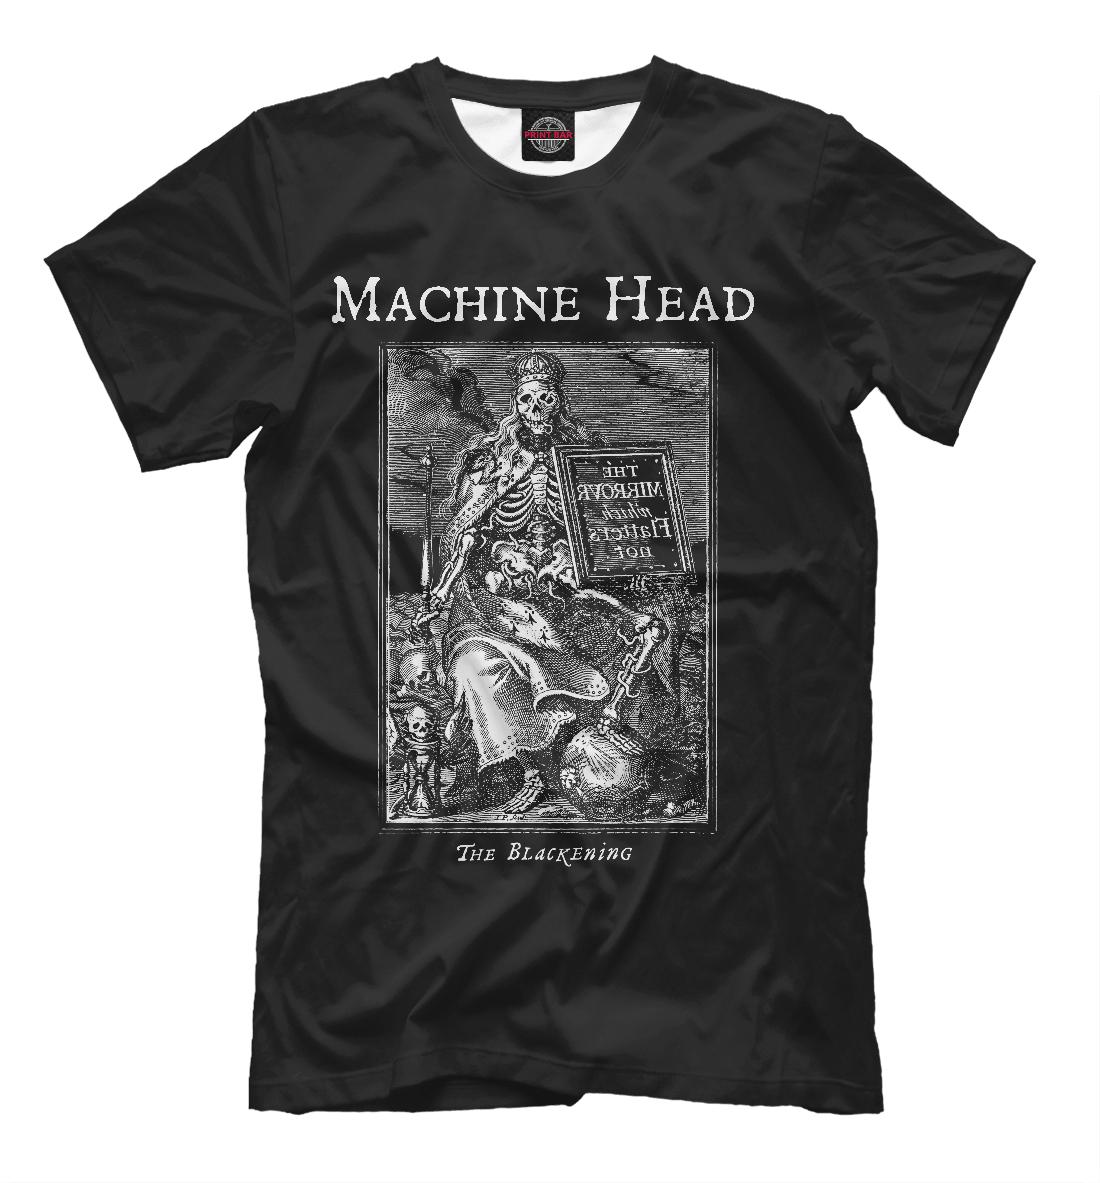 Купить Machine Head, Printbar, Футболки, MZK-354049-fut-2